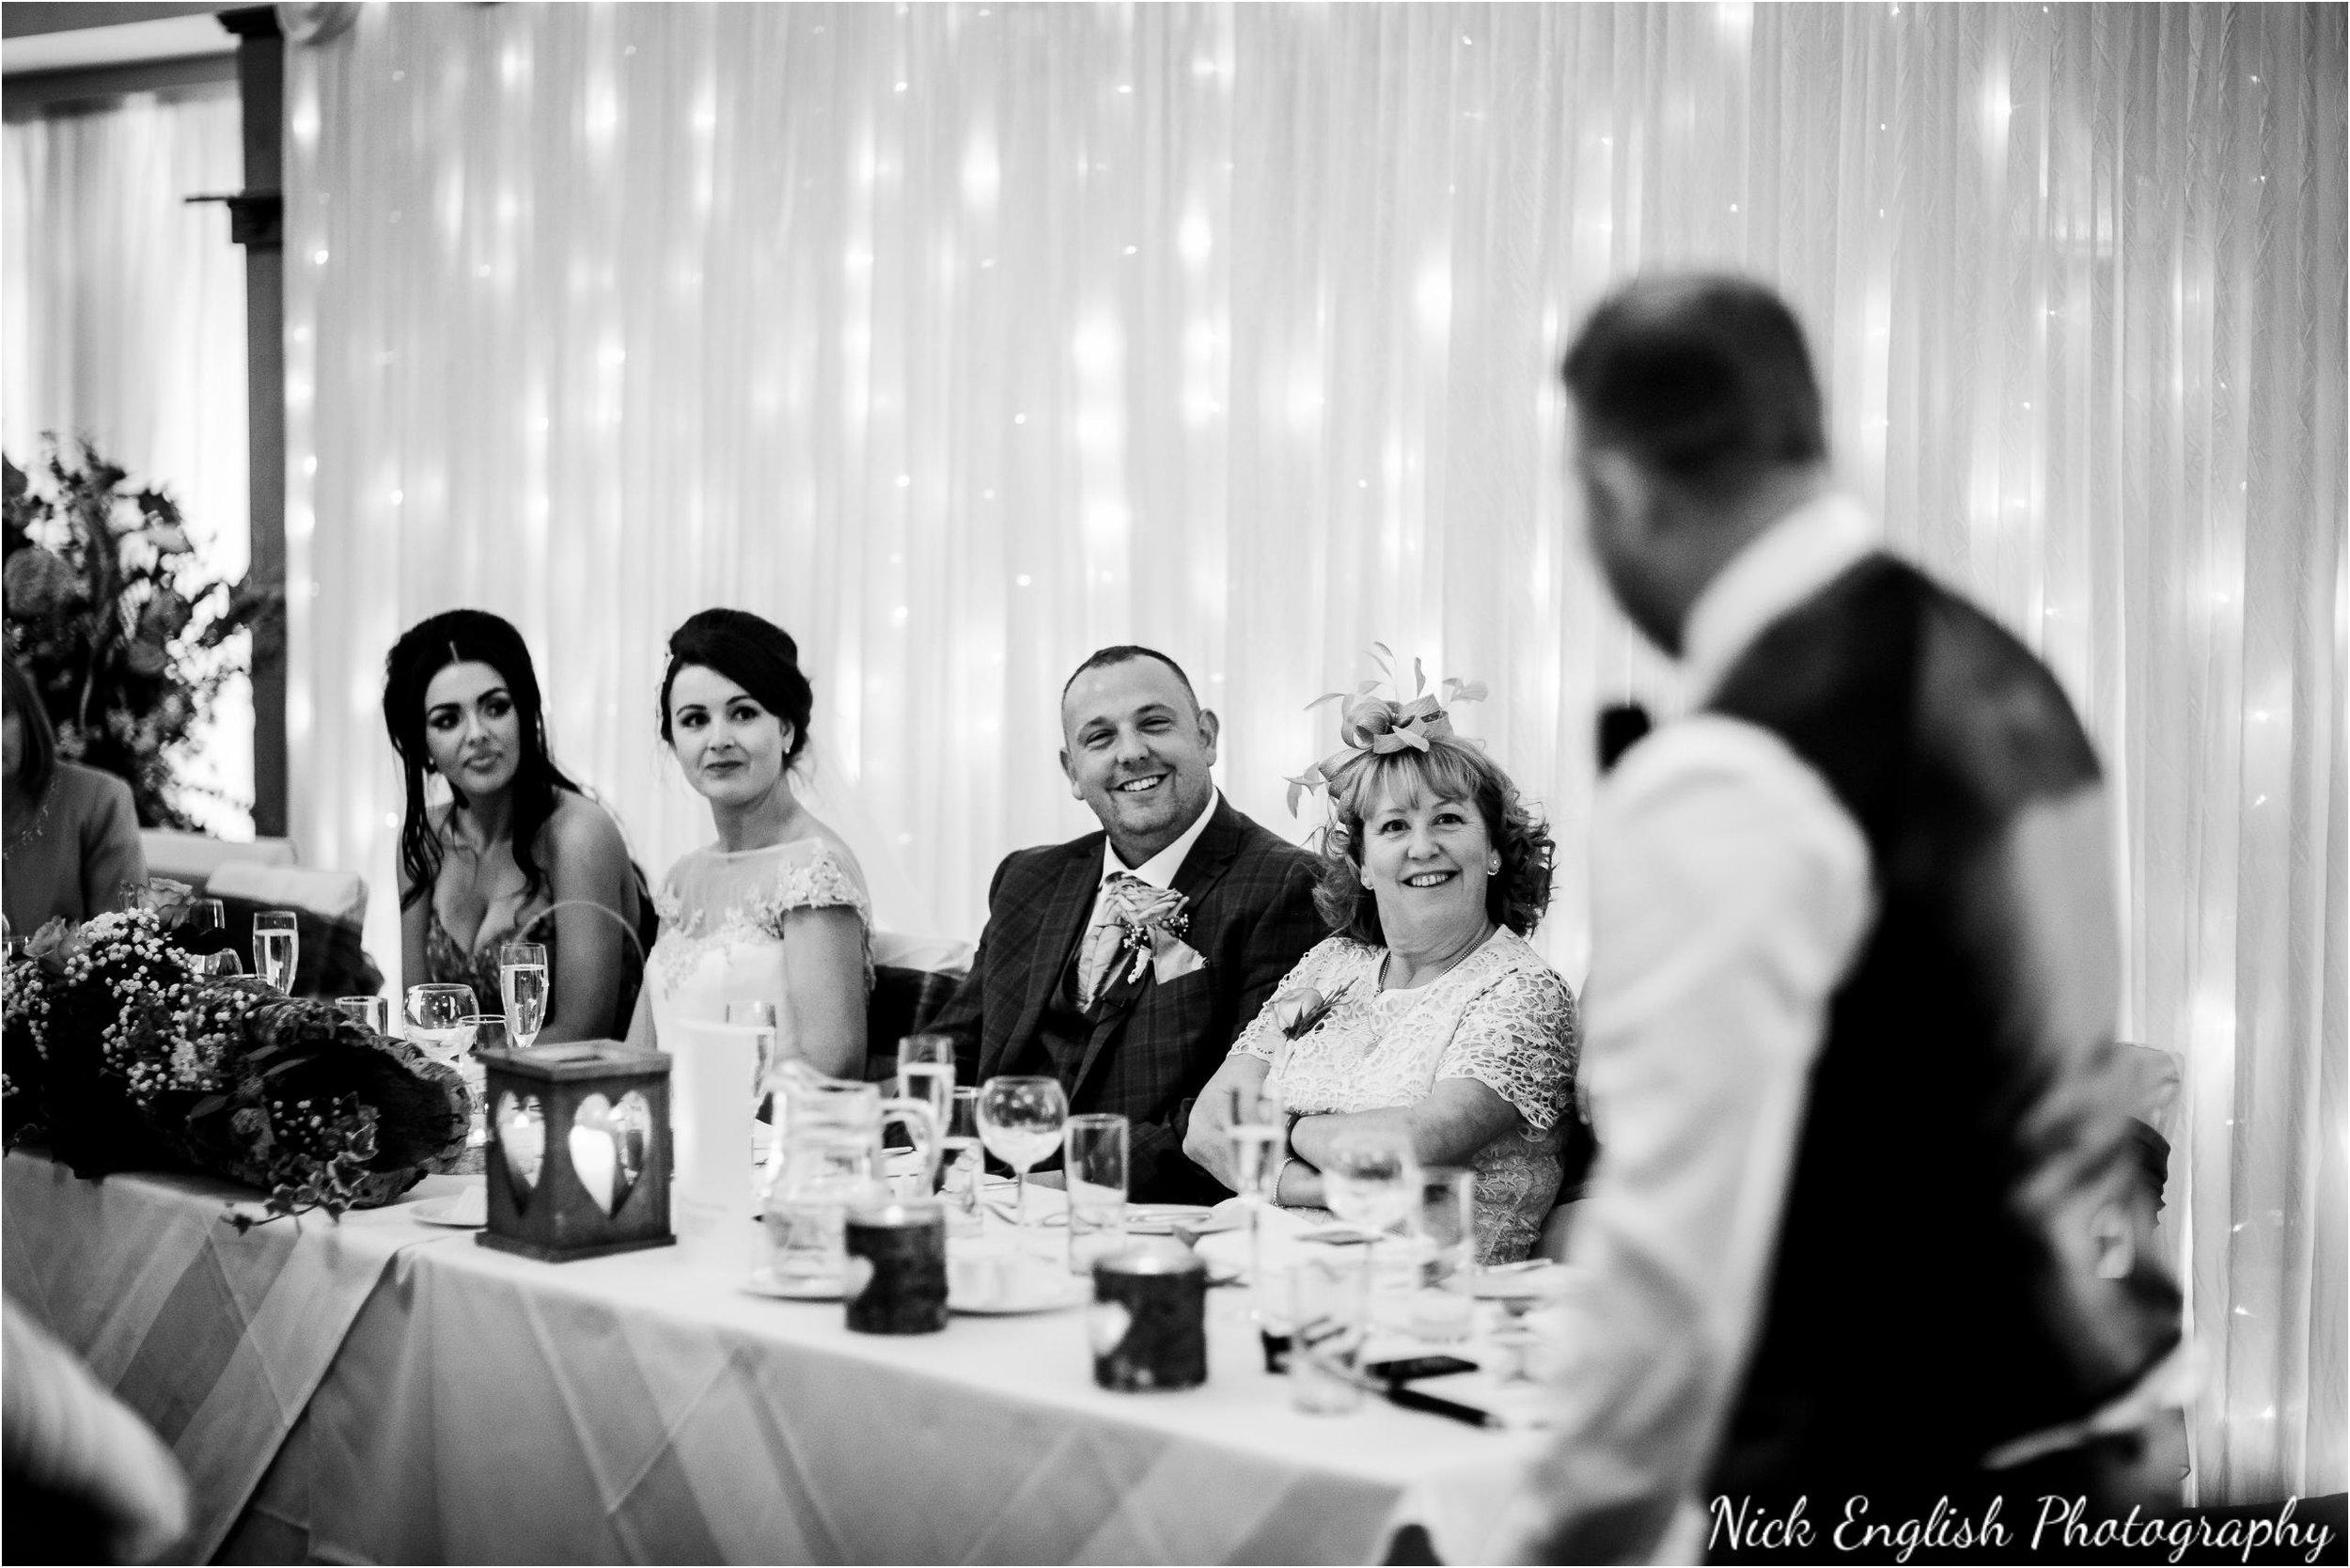 Stacey-Ash-Wedding-Photographs-Stanley-House-Preston-Lancashire-177.jpg